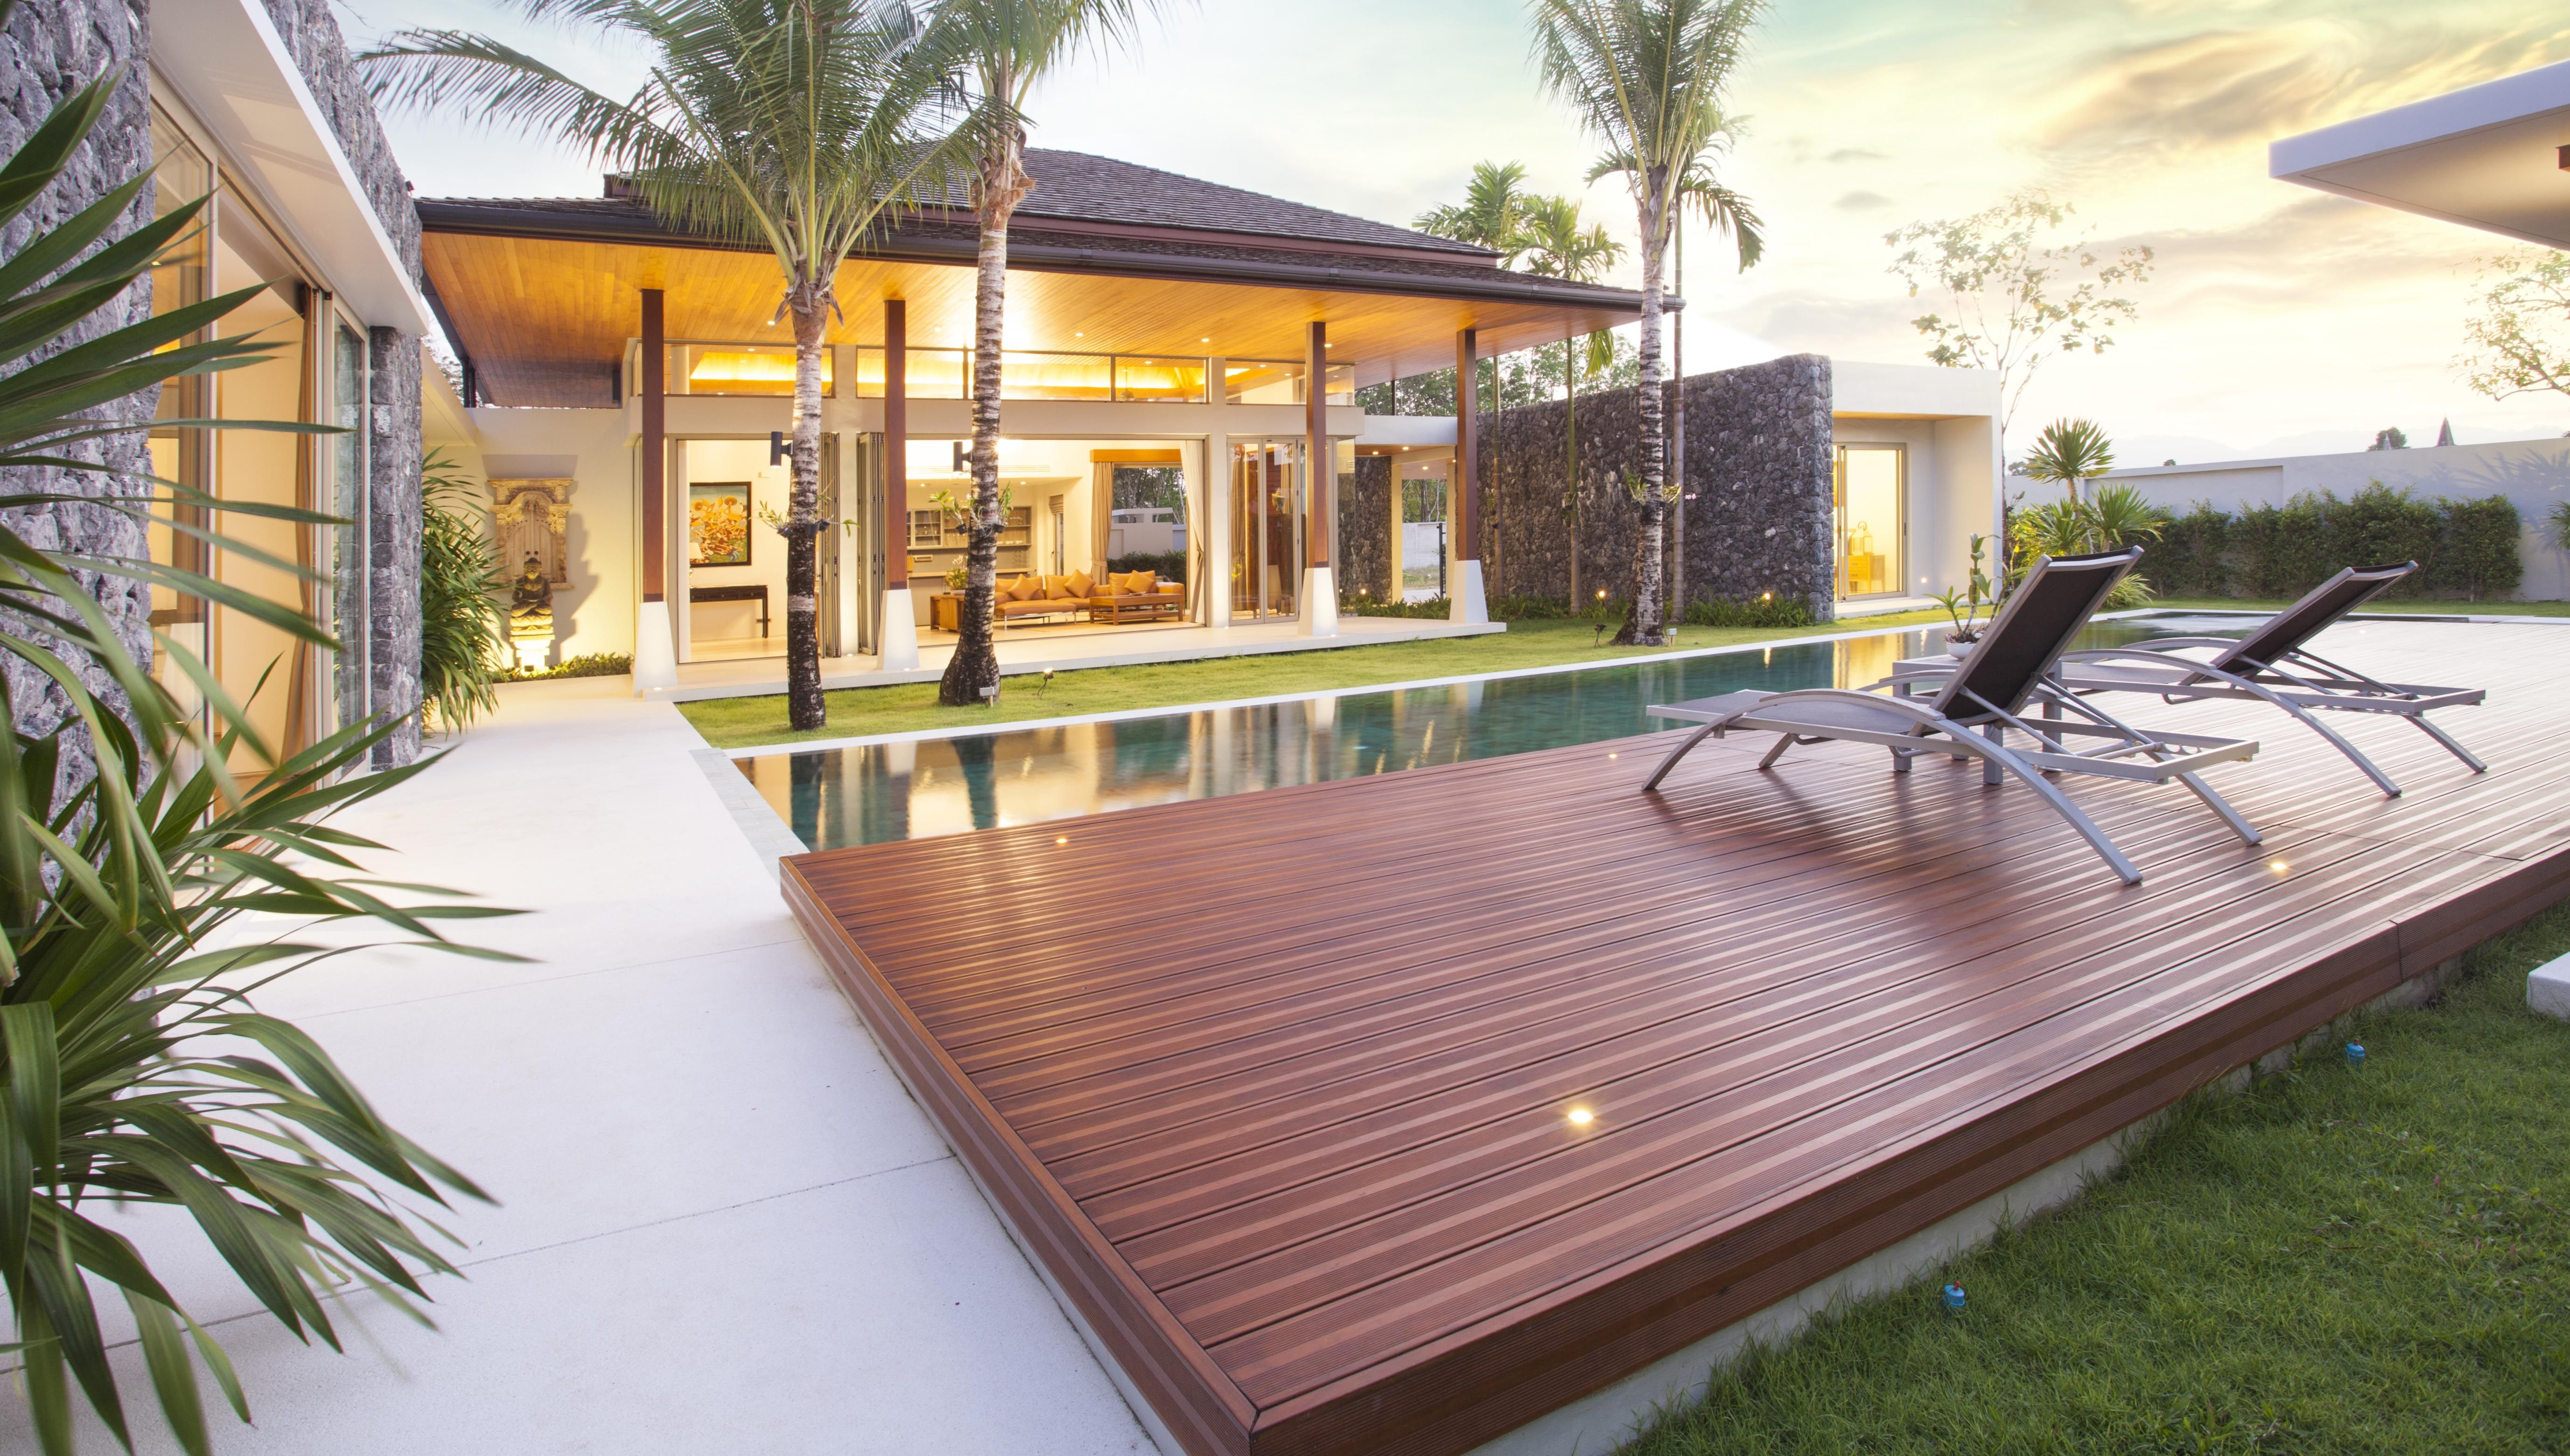 Sliding Deck Pool Covers Cost Designs Pros Cons Pool Decks Pool Cover Decks Backyard